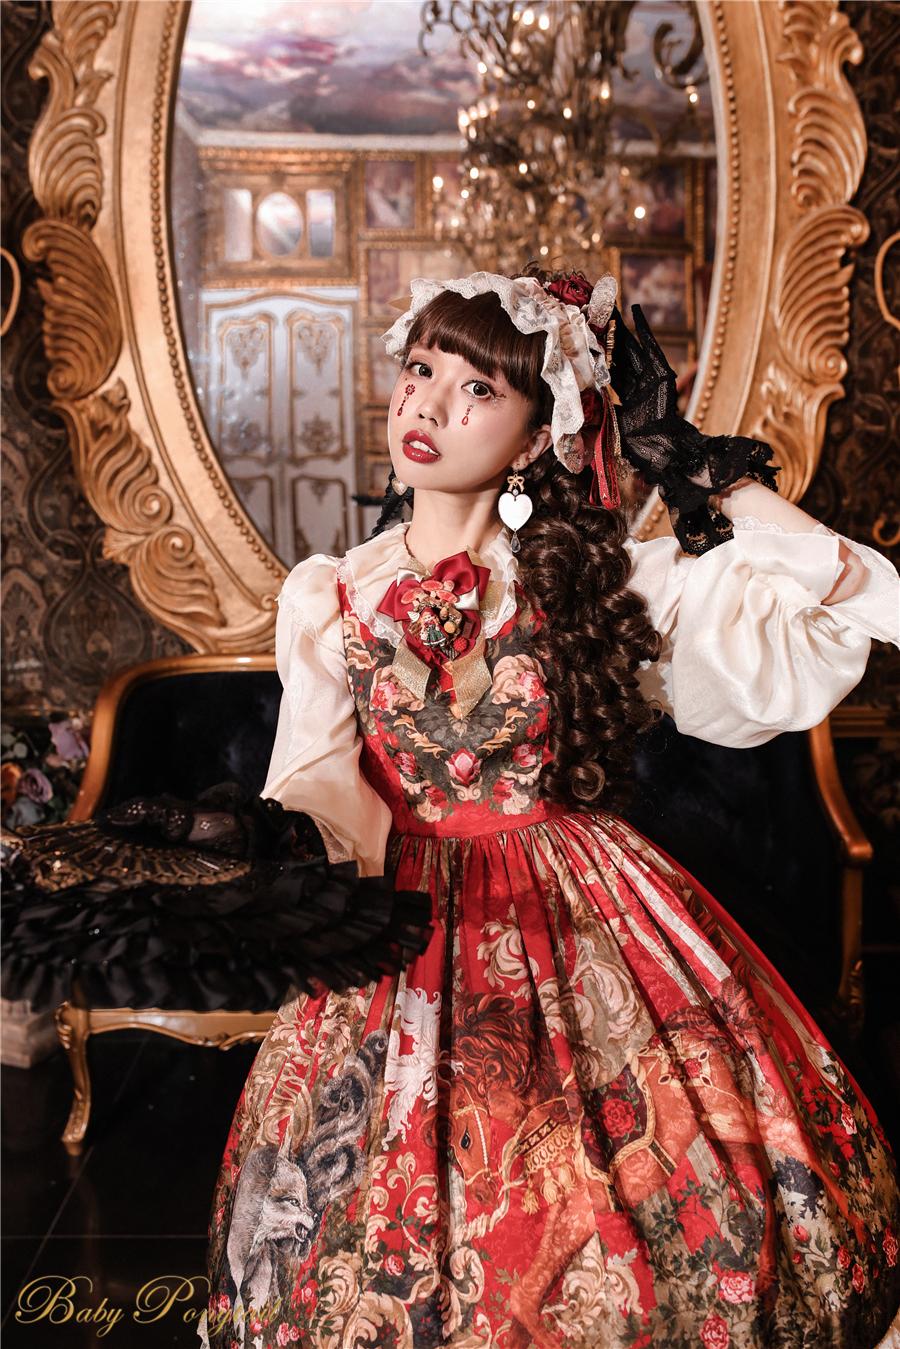 BabyPonytail_Rose Battle_Model Photo_JSK Red_Kaka_9.jpg